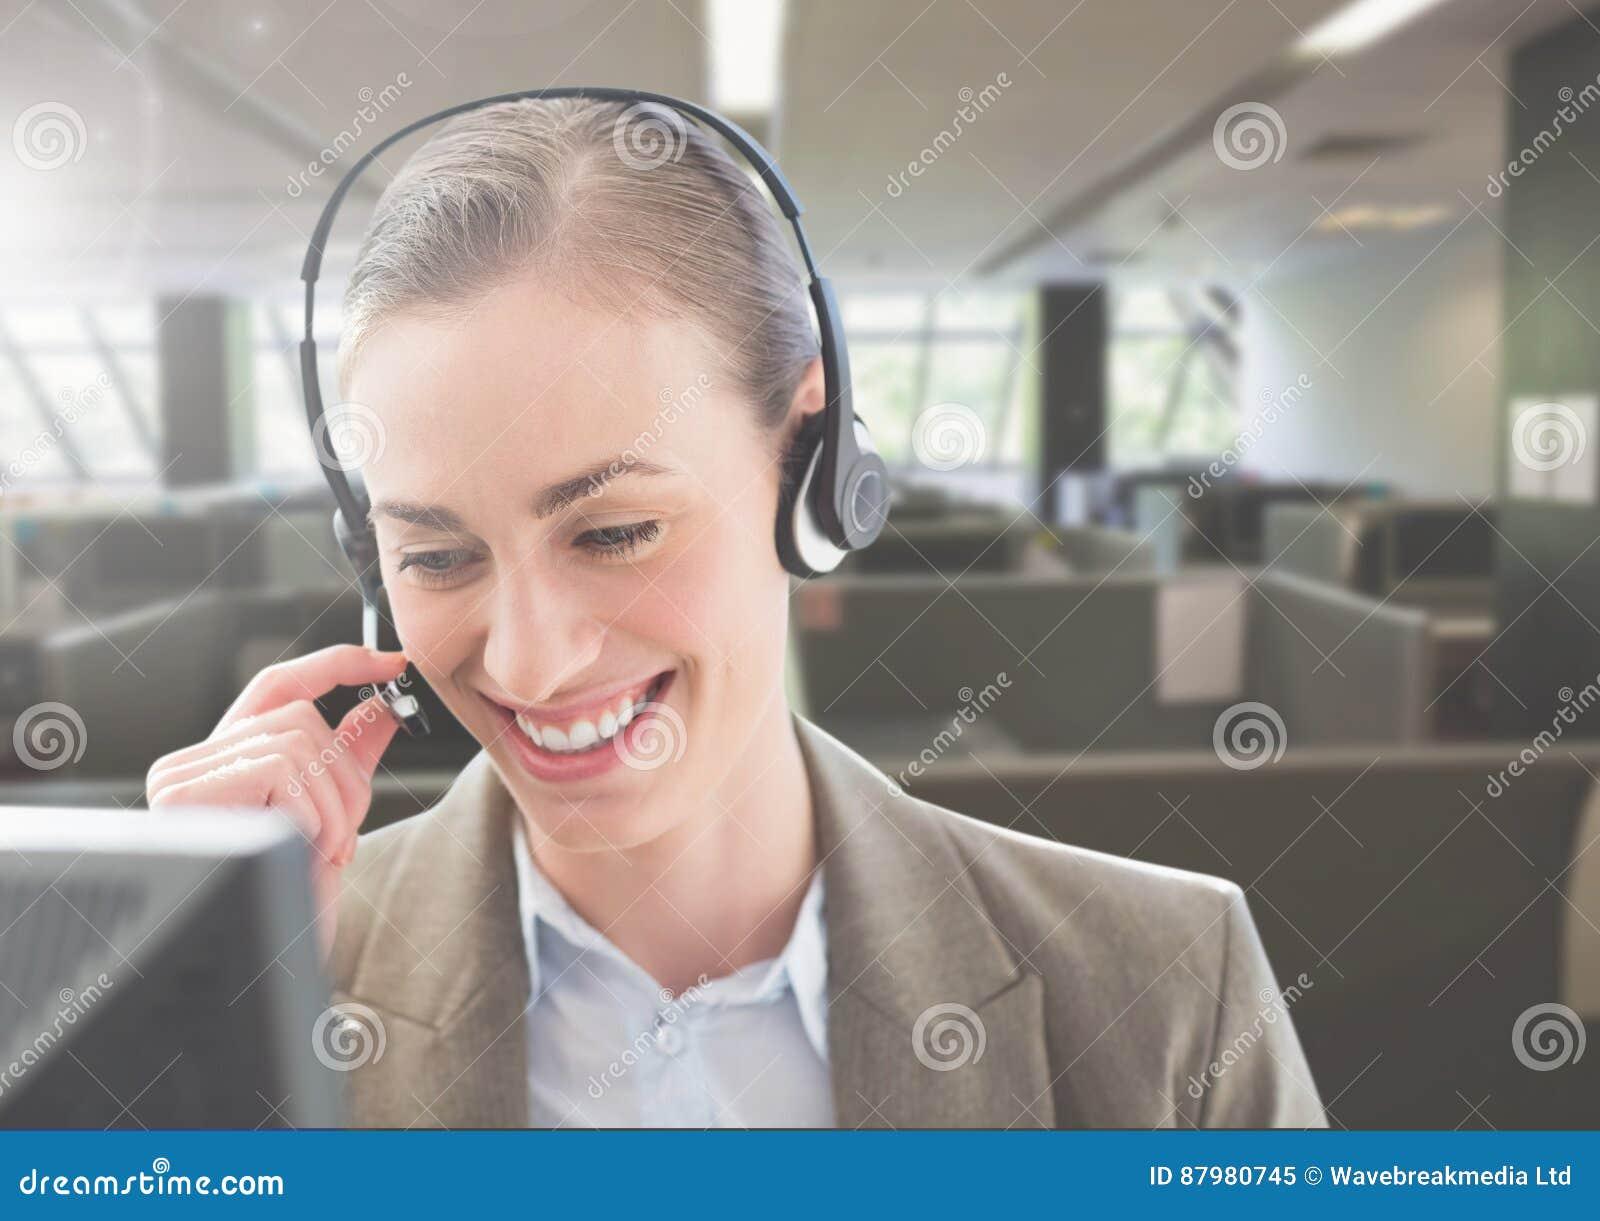 Customer service woman talking on headphone in office